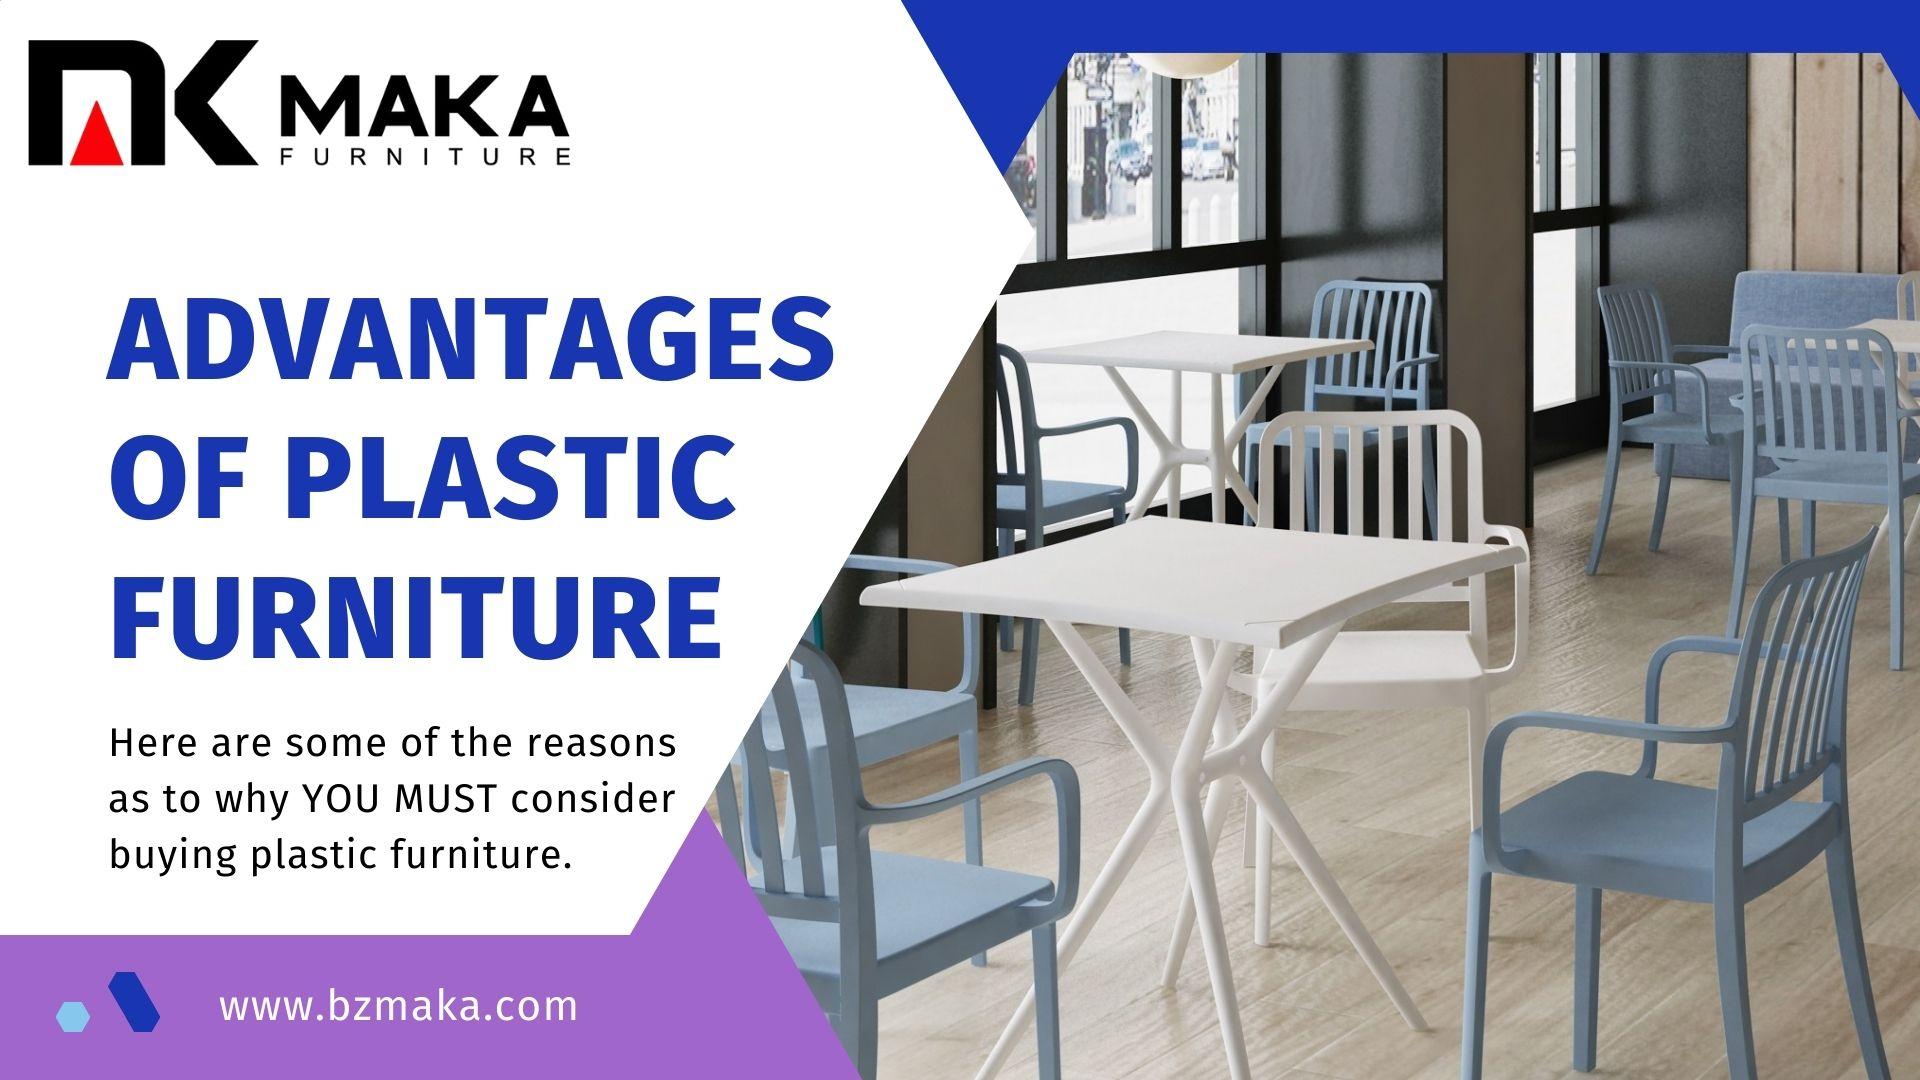 Advantages of Plastic Furniture